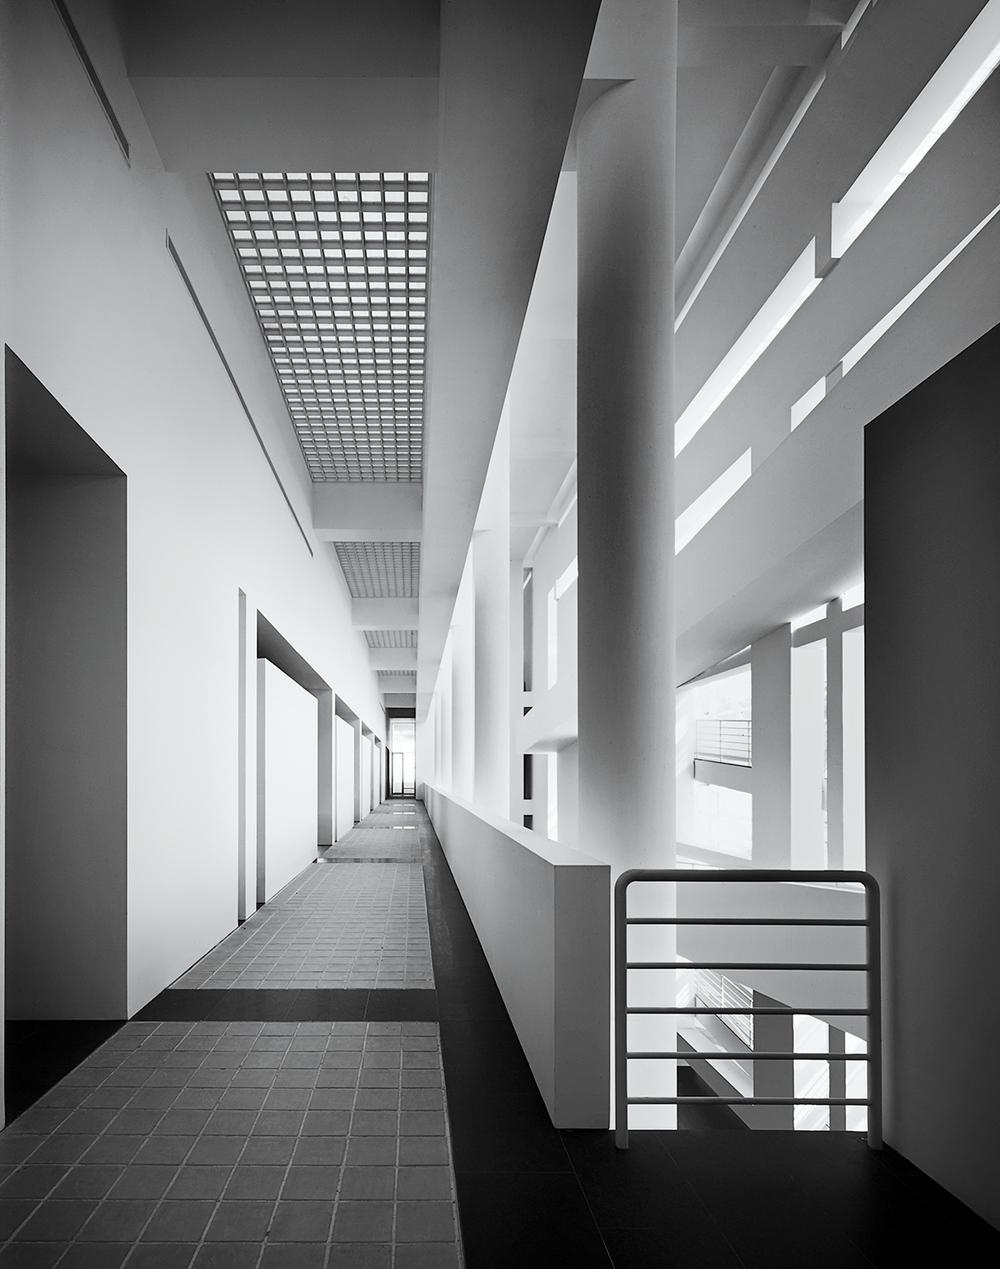 MACBA Museum| Richard Meier | Barcelona